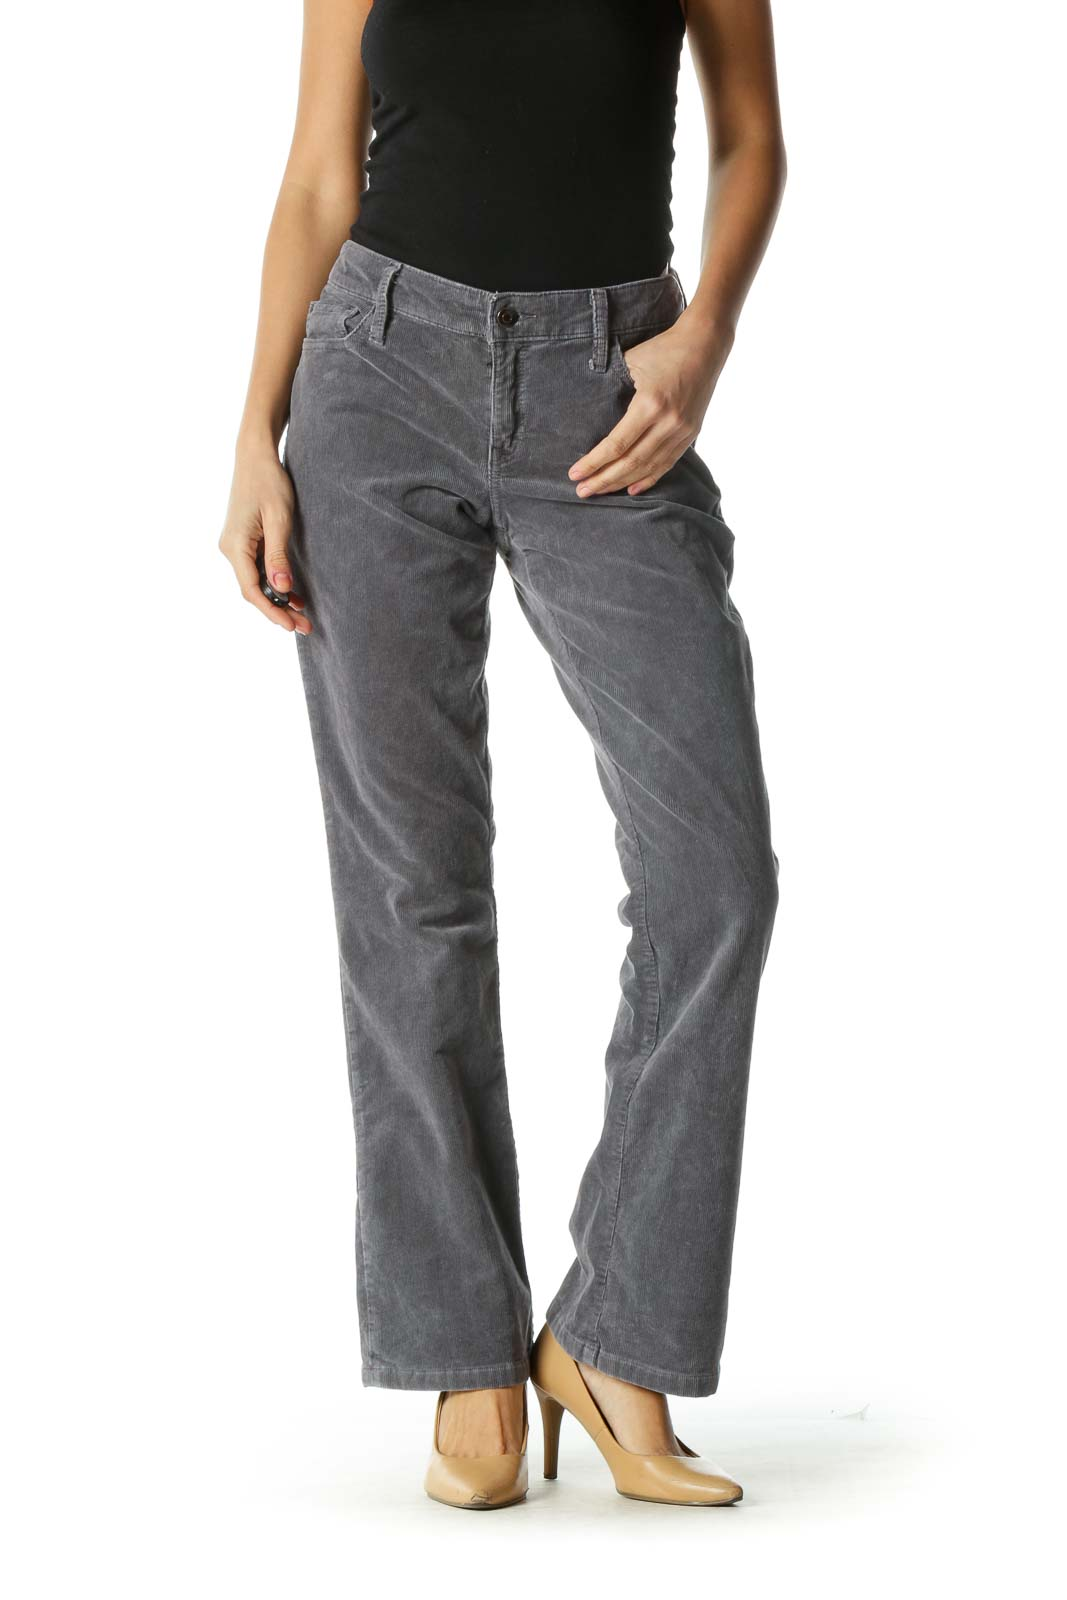 Gray Corduroy Boot Cut Pants